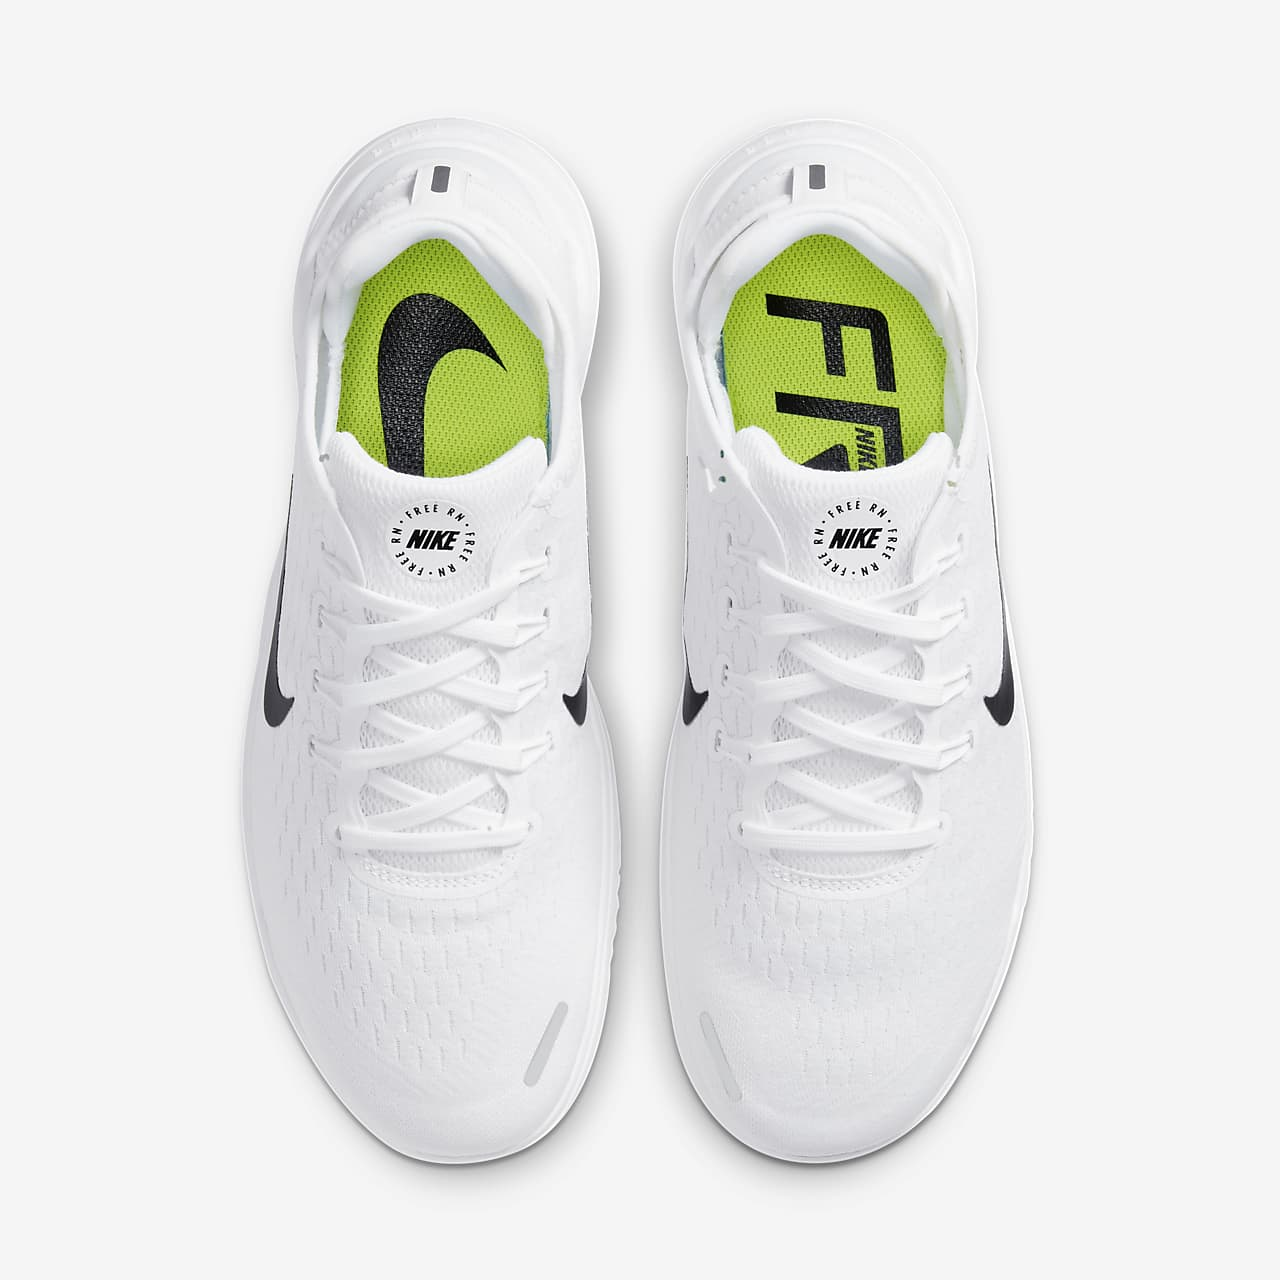 big sale 4458b ad285 ... Nike Free RN 2018 Men s Running Shoe